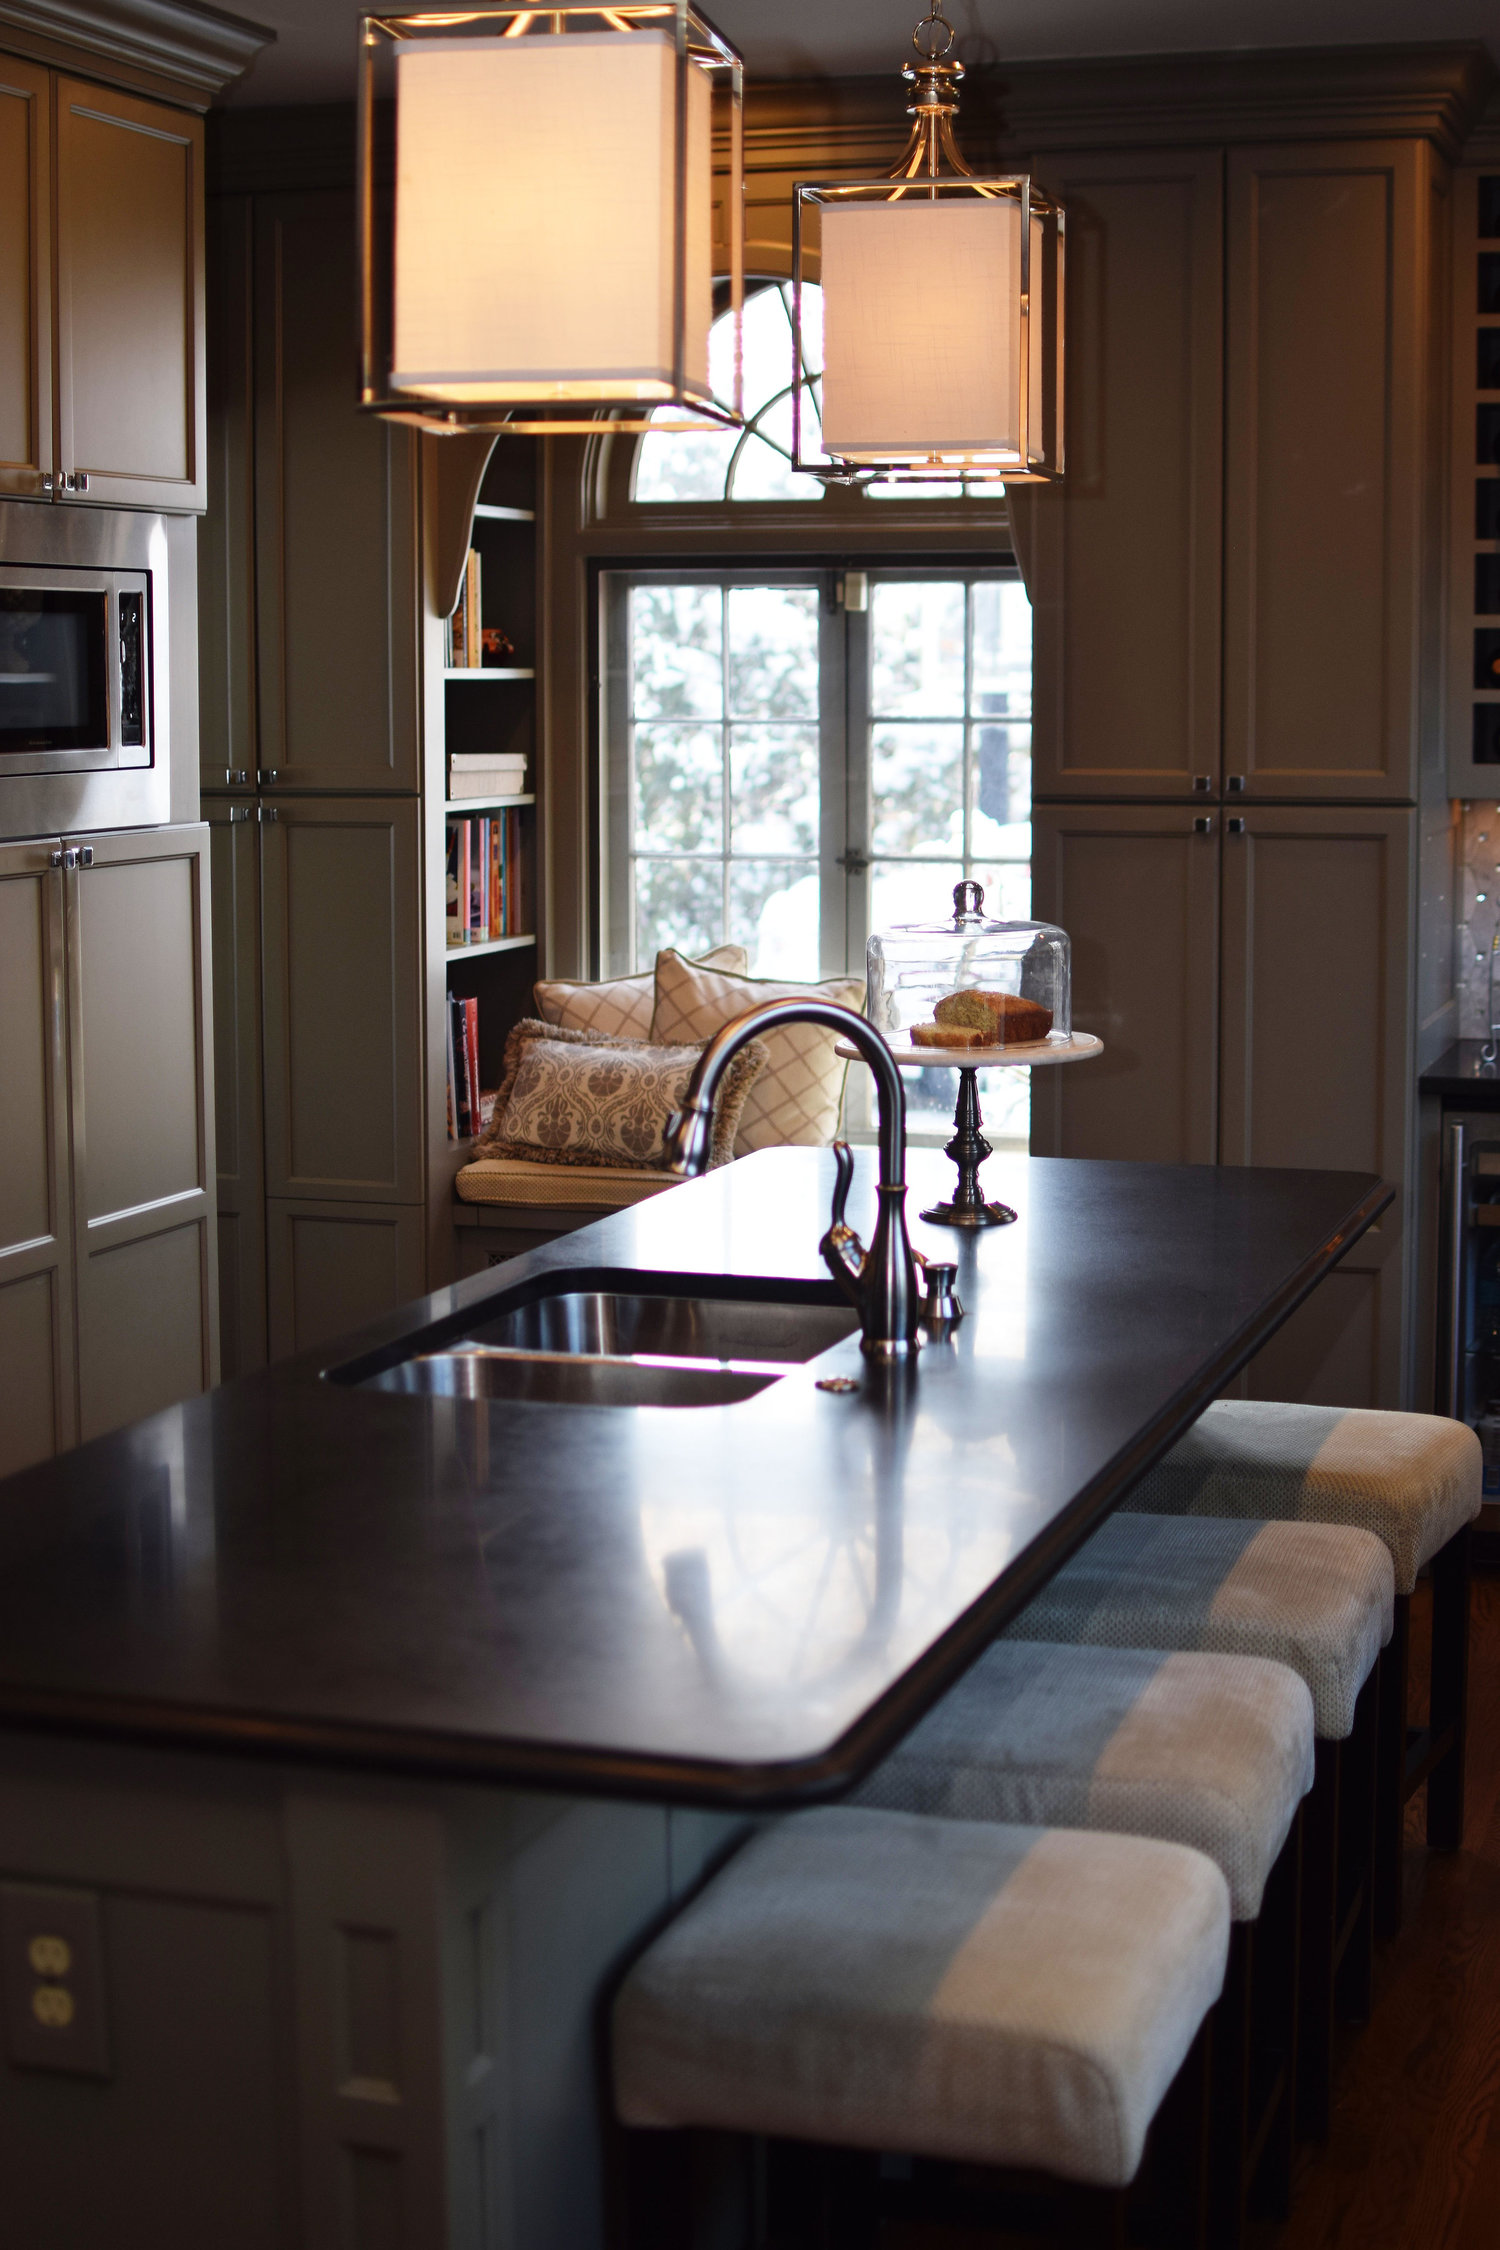 Cindy Lynch Kitchen and Bath Design